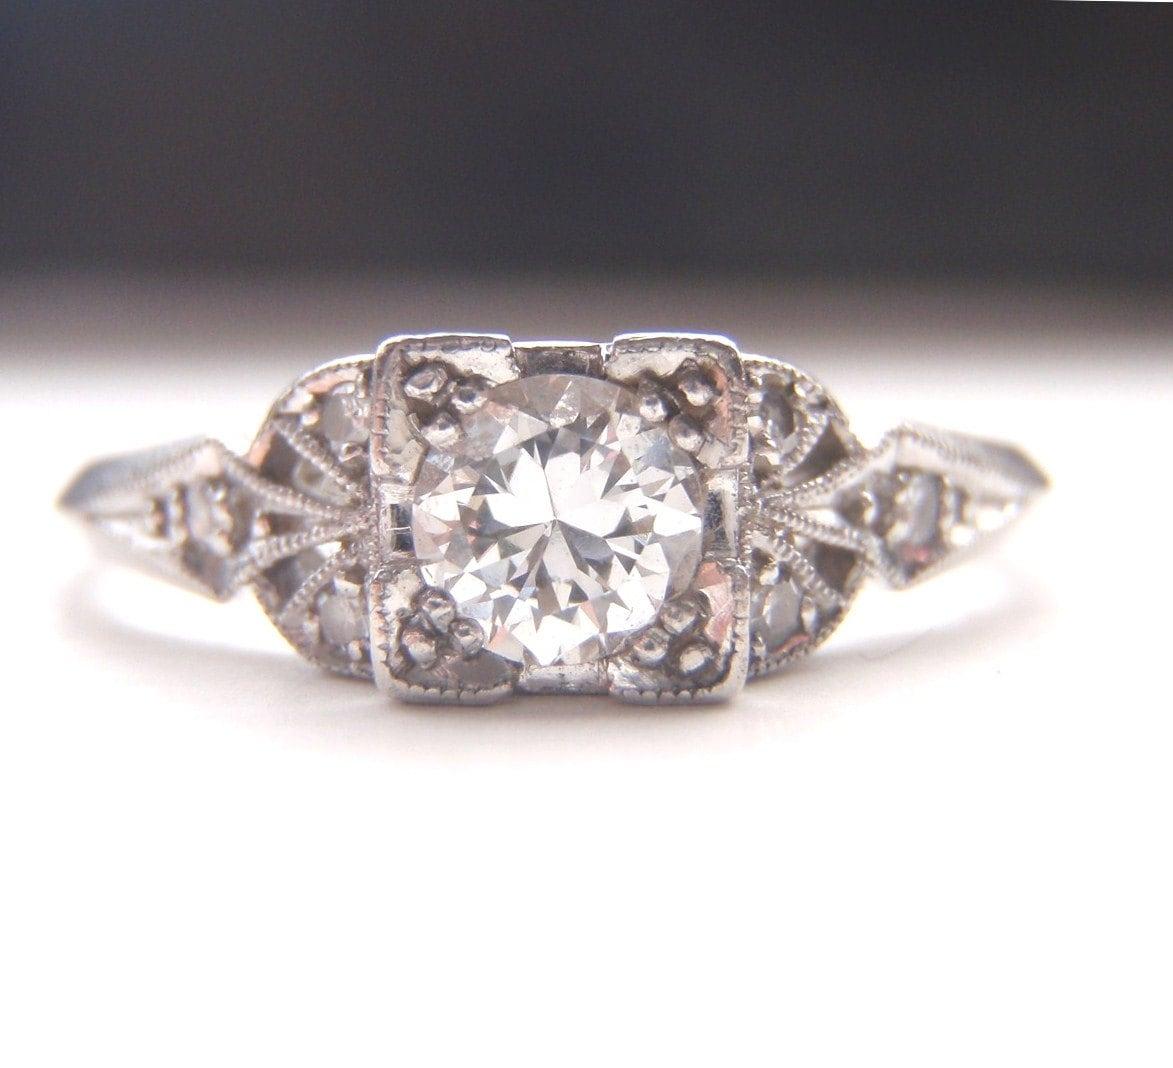 Edwardian Art Deco Engagement Ring Quality Platinum And